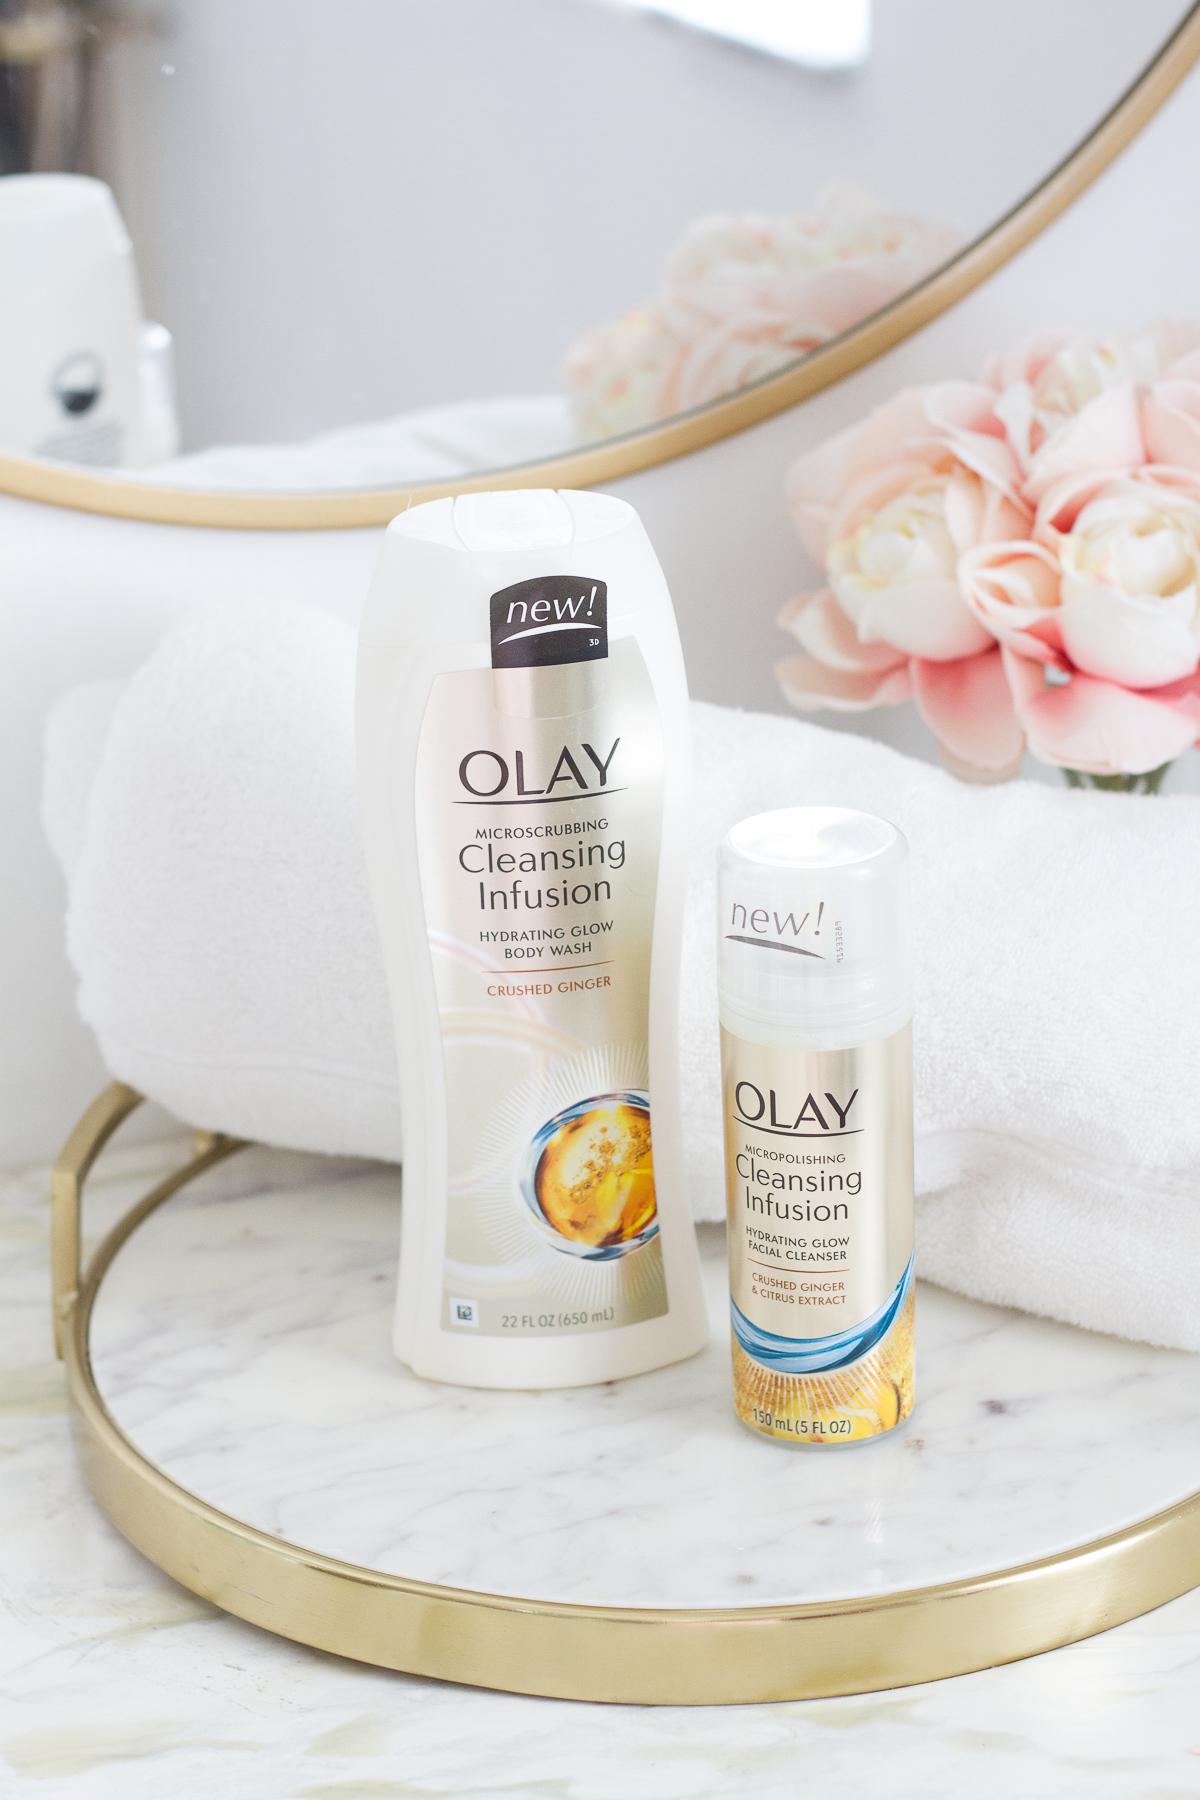 Olay Glow Up-3